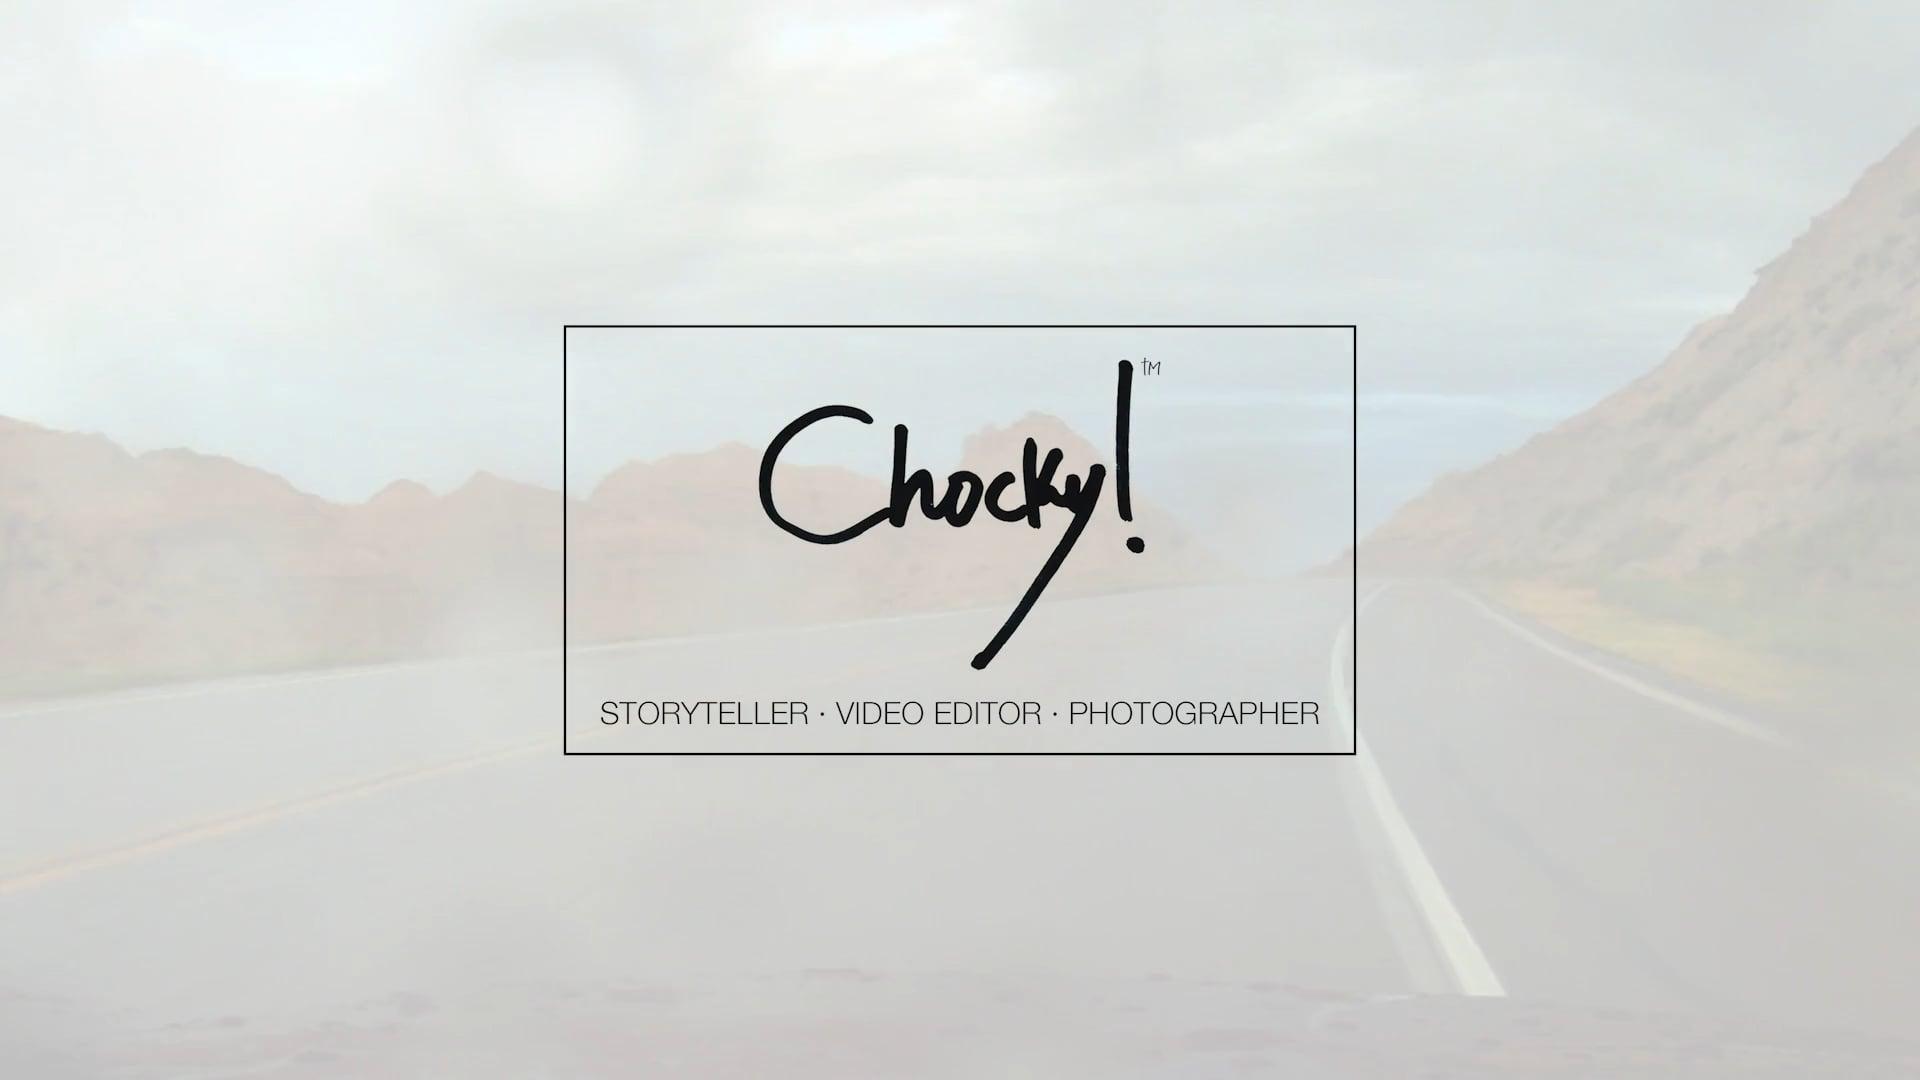 Chocky's Reel